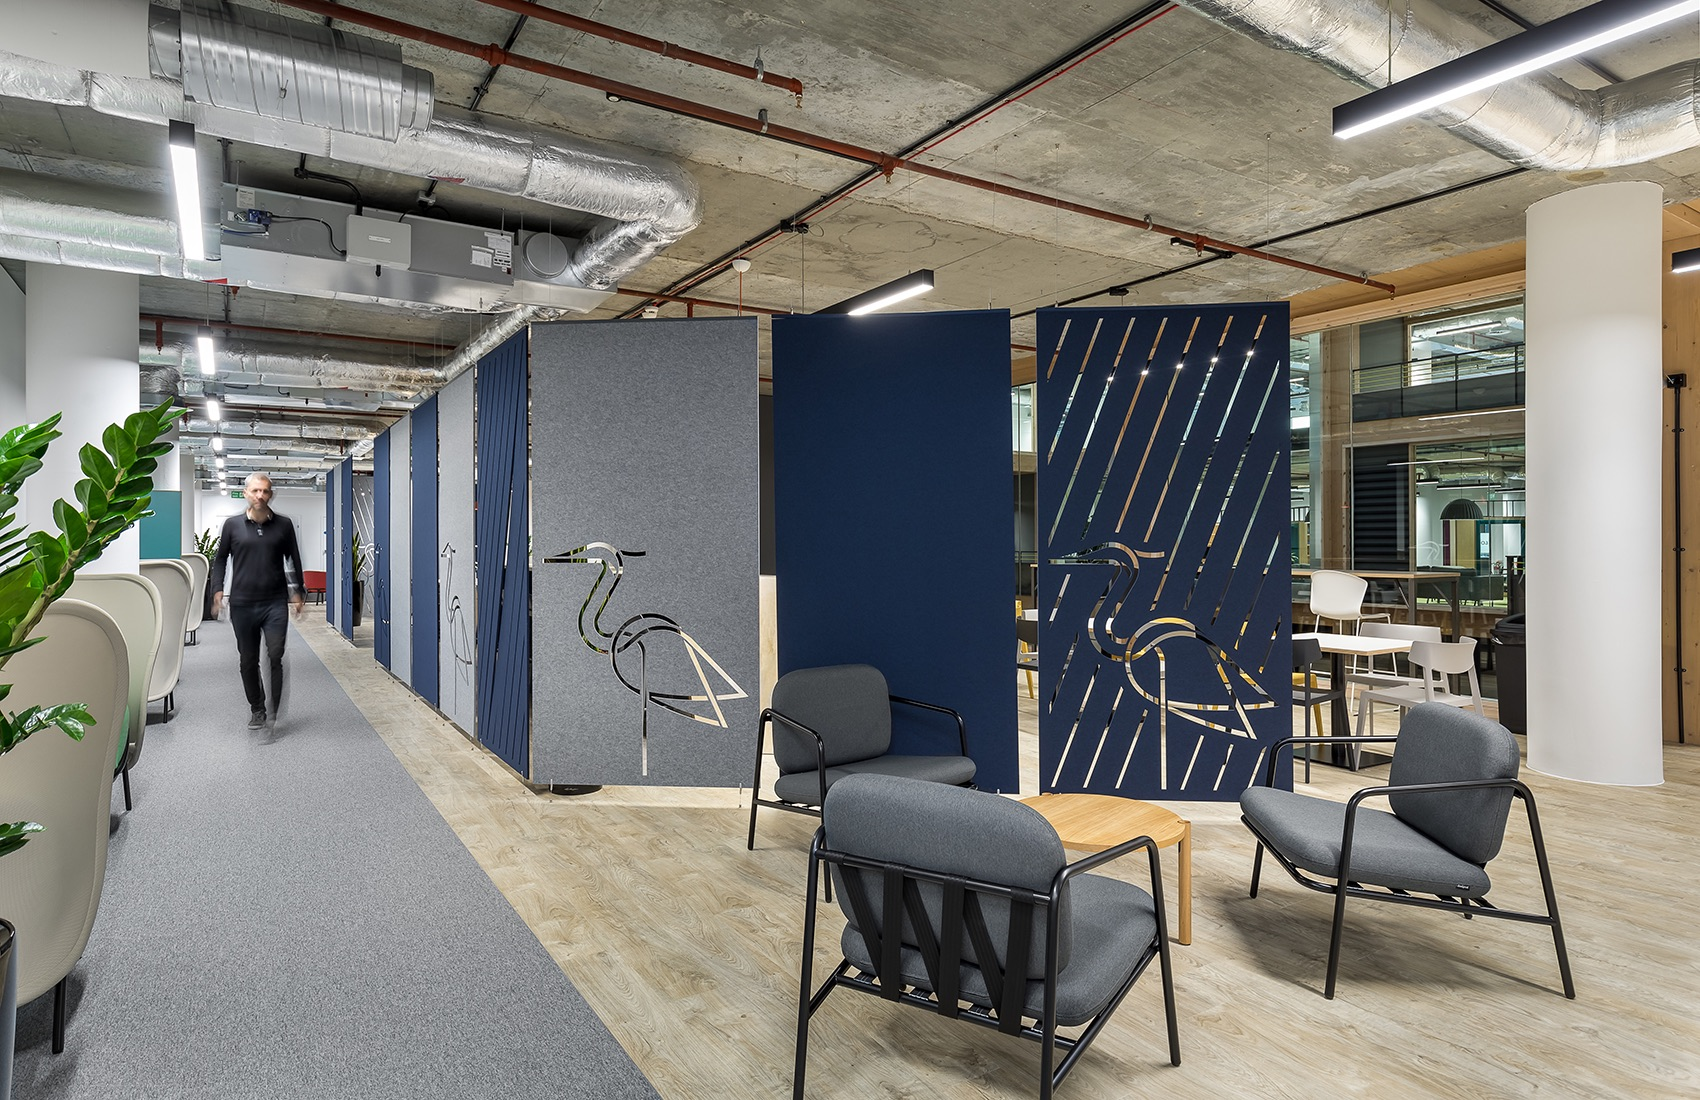 anglia-ruskin-university-office-london-20